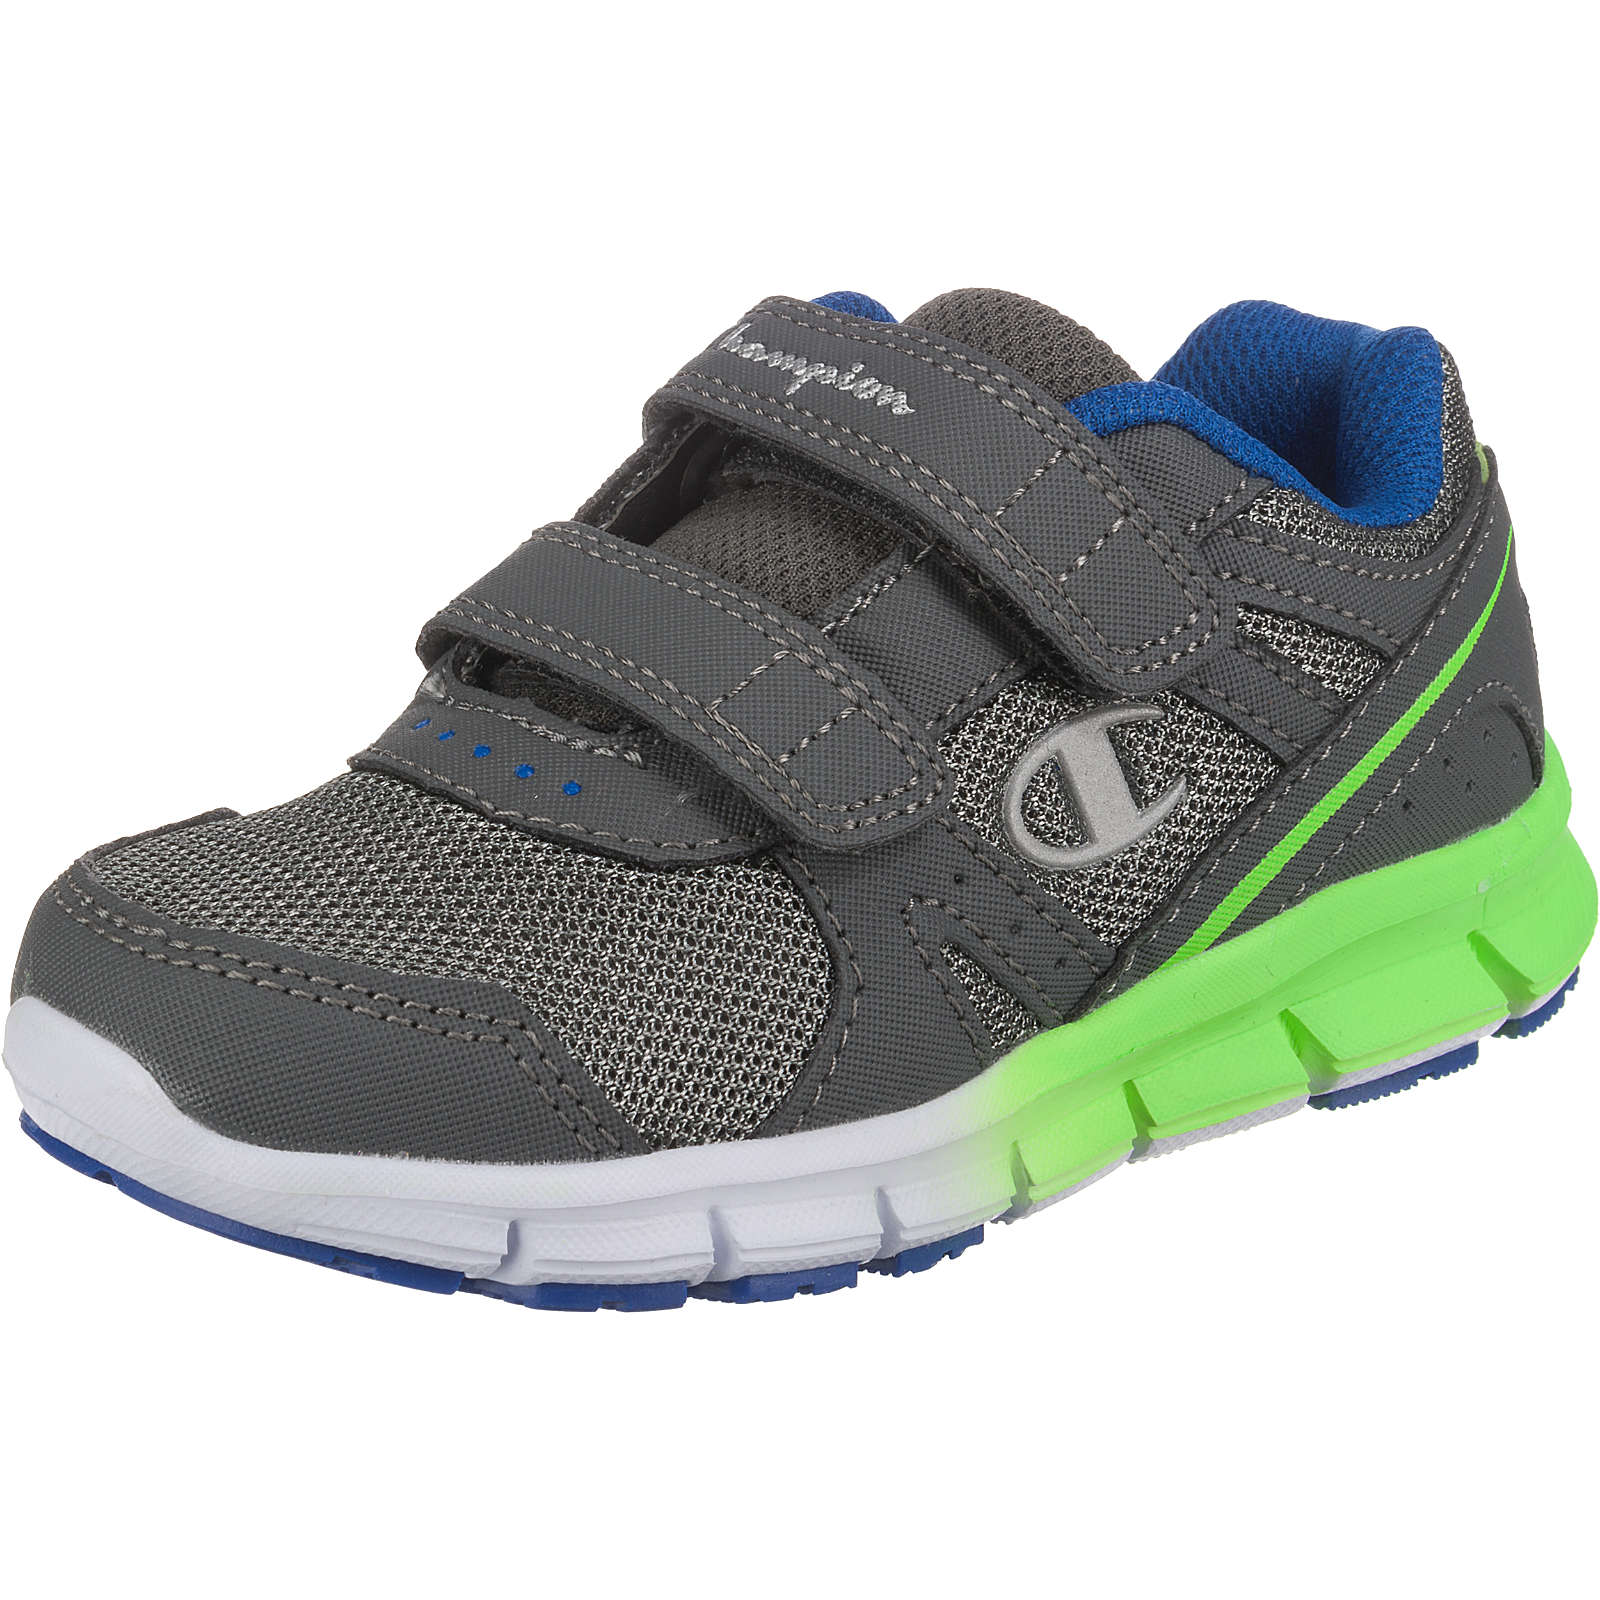 Champion Sneakers Low Combo für Jungen grün Junge Gr. 34